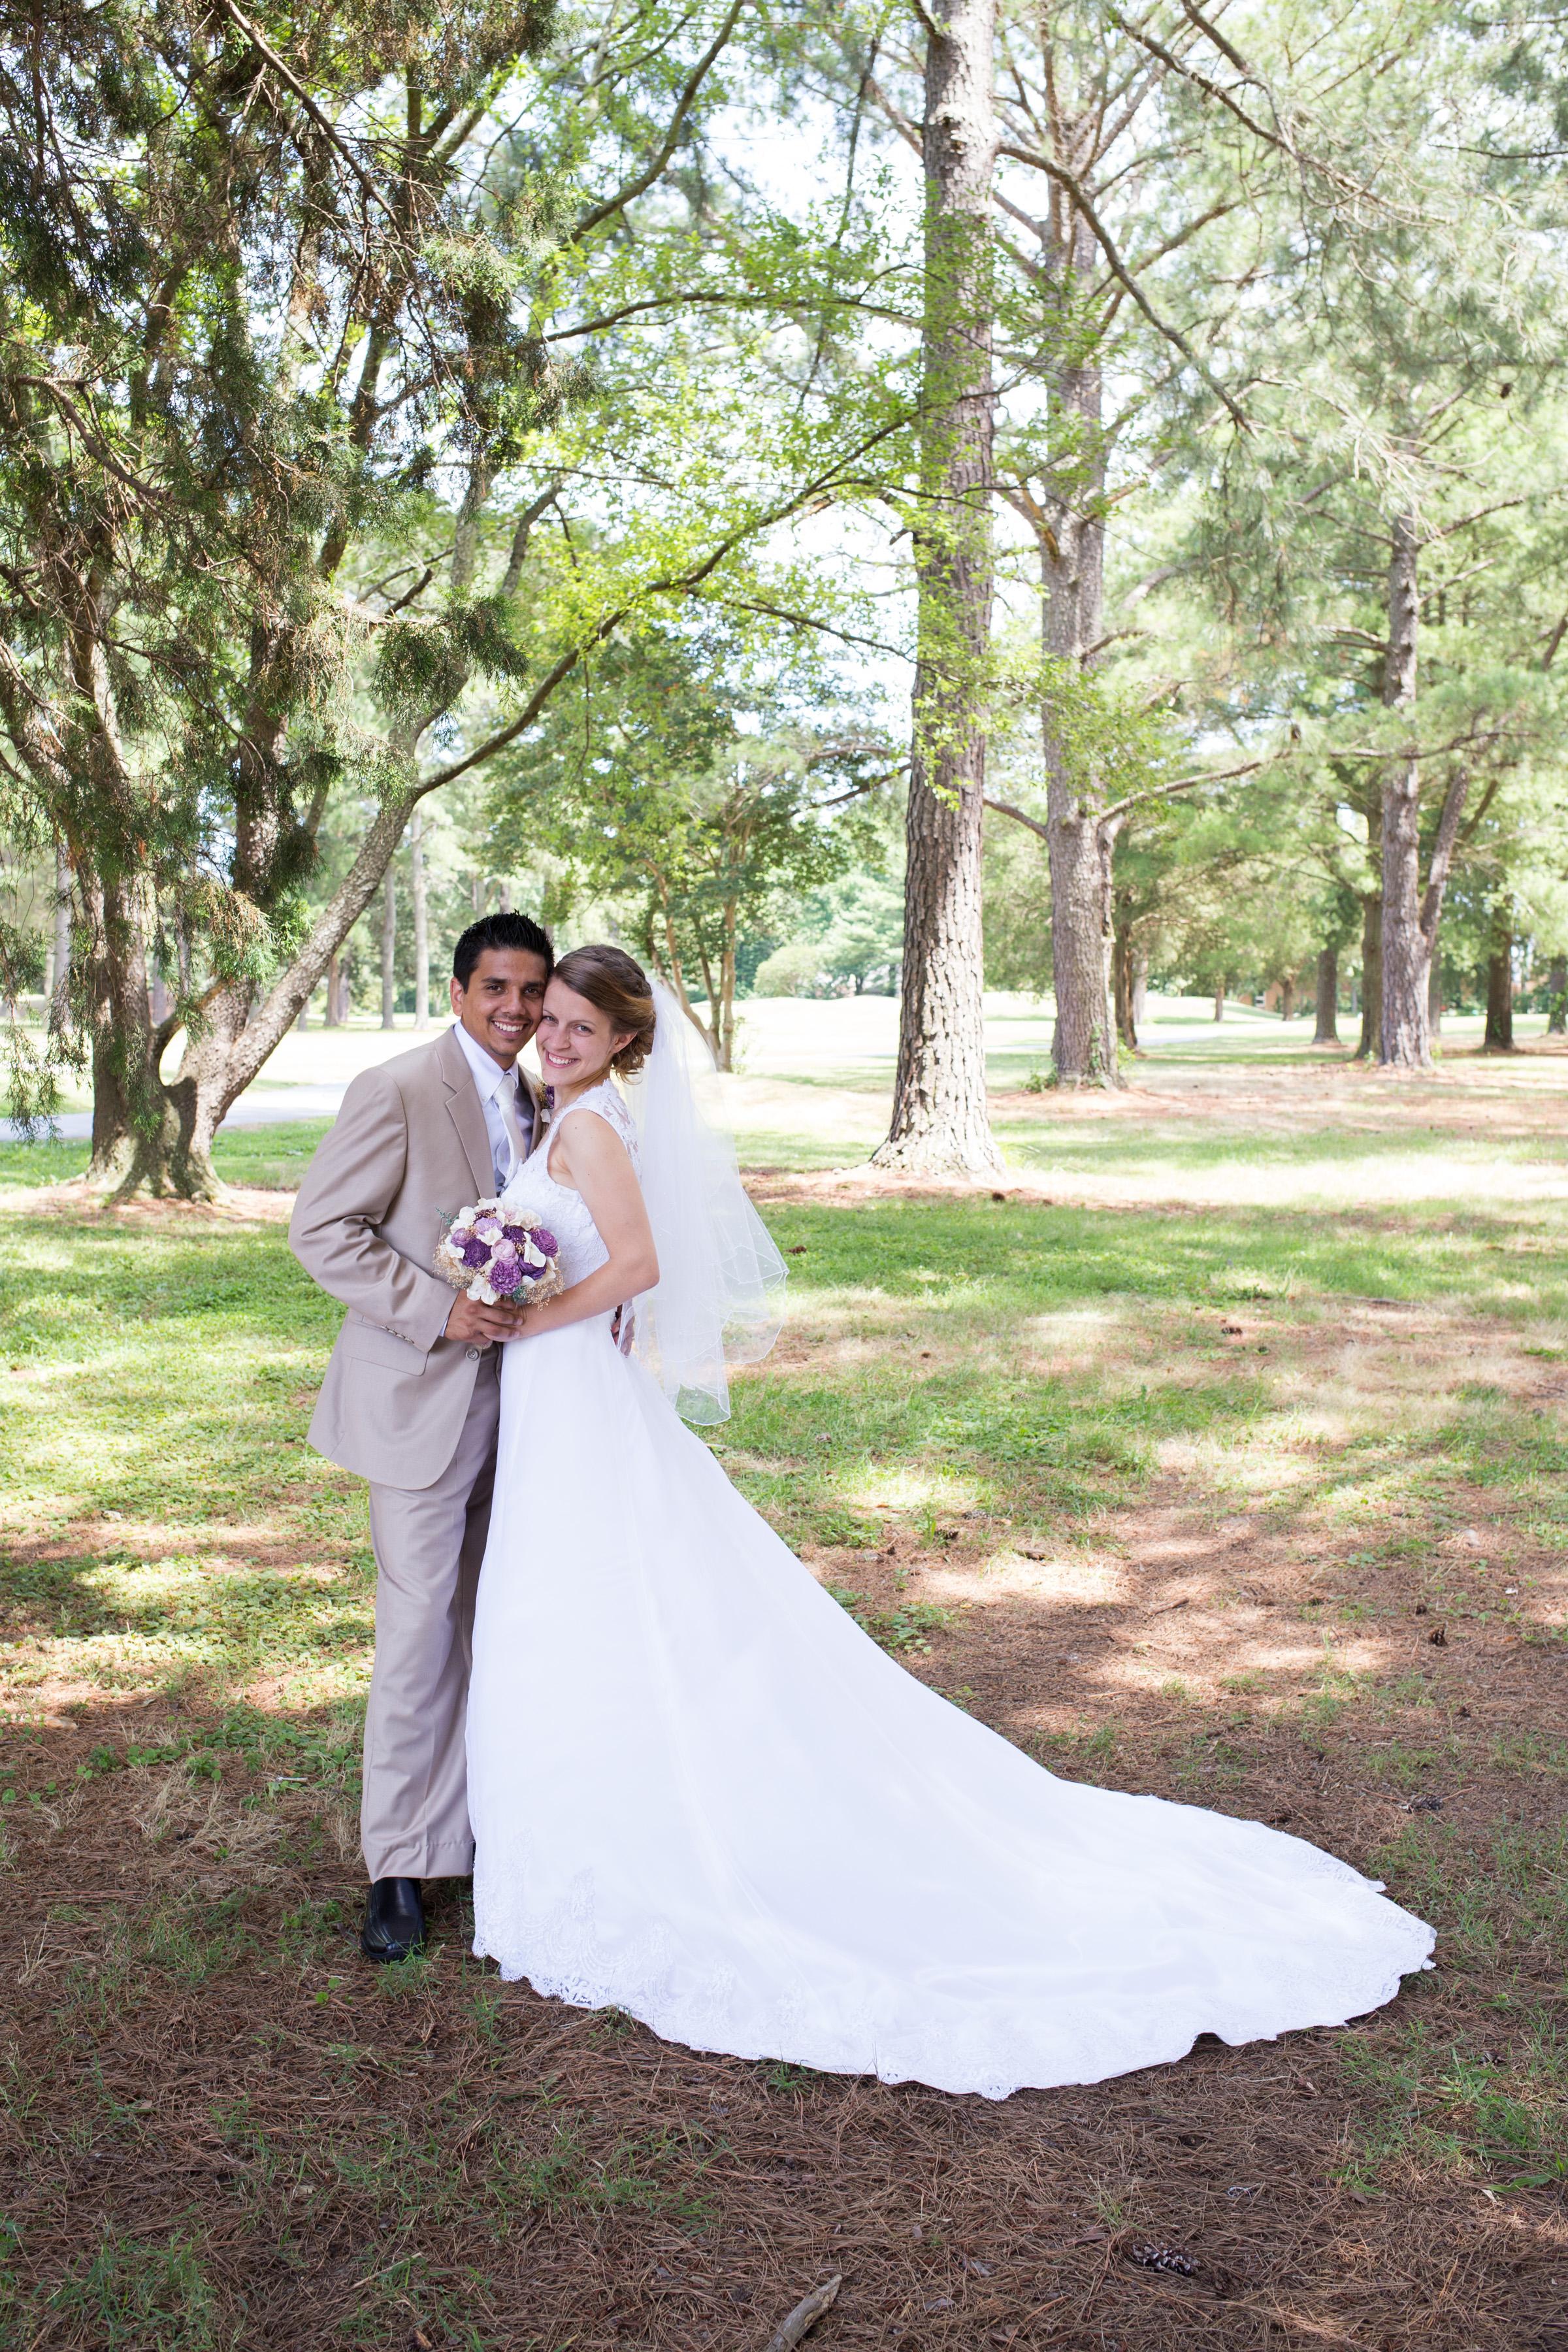 Kate&Lucas__wedding_00530.jpg